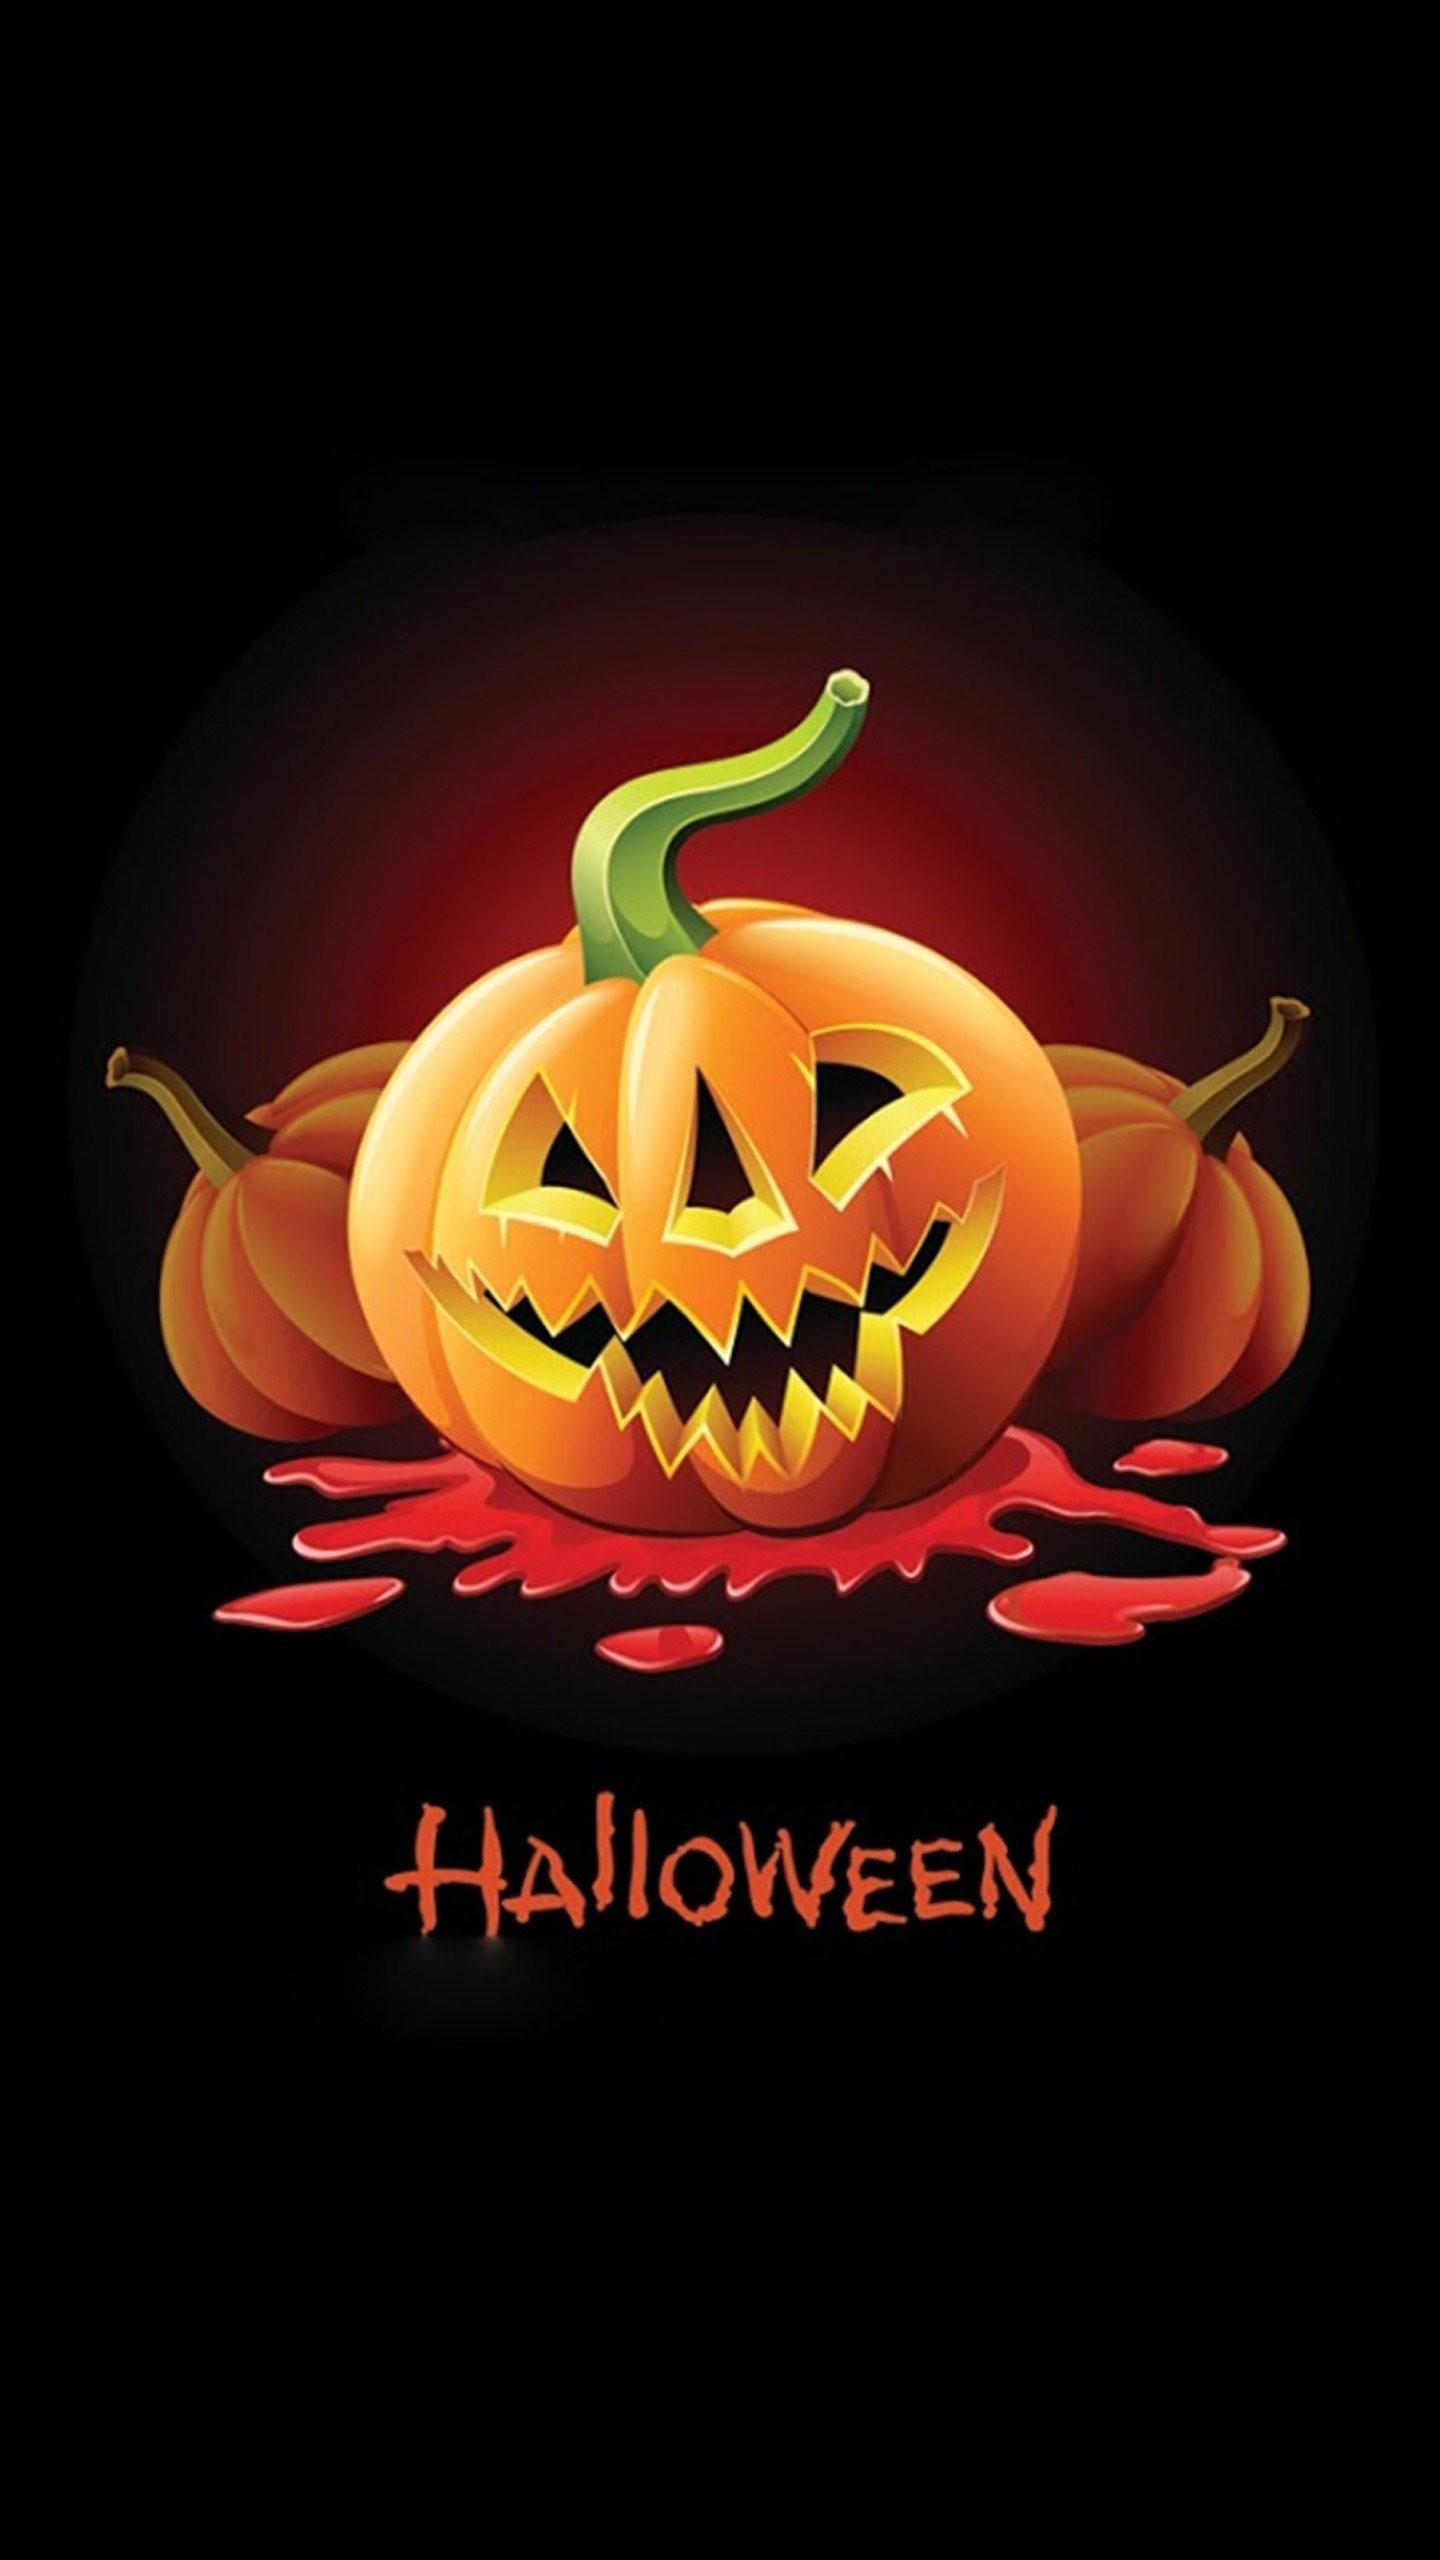 Wonderful Wallpaper Halloween Galaxy S6 - halloween-pumpkin-2-wallpaper-background-1440x2560  Pictures_569142.jpg